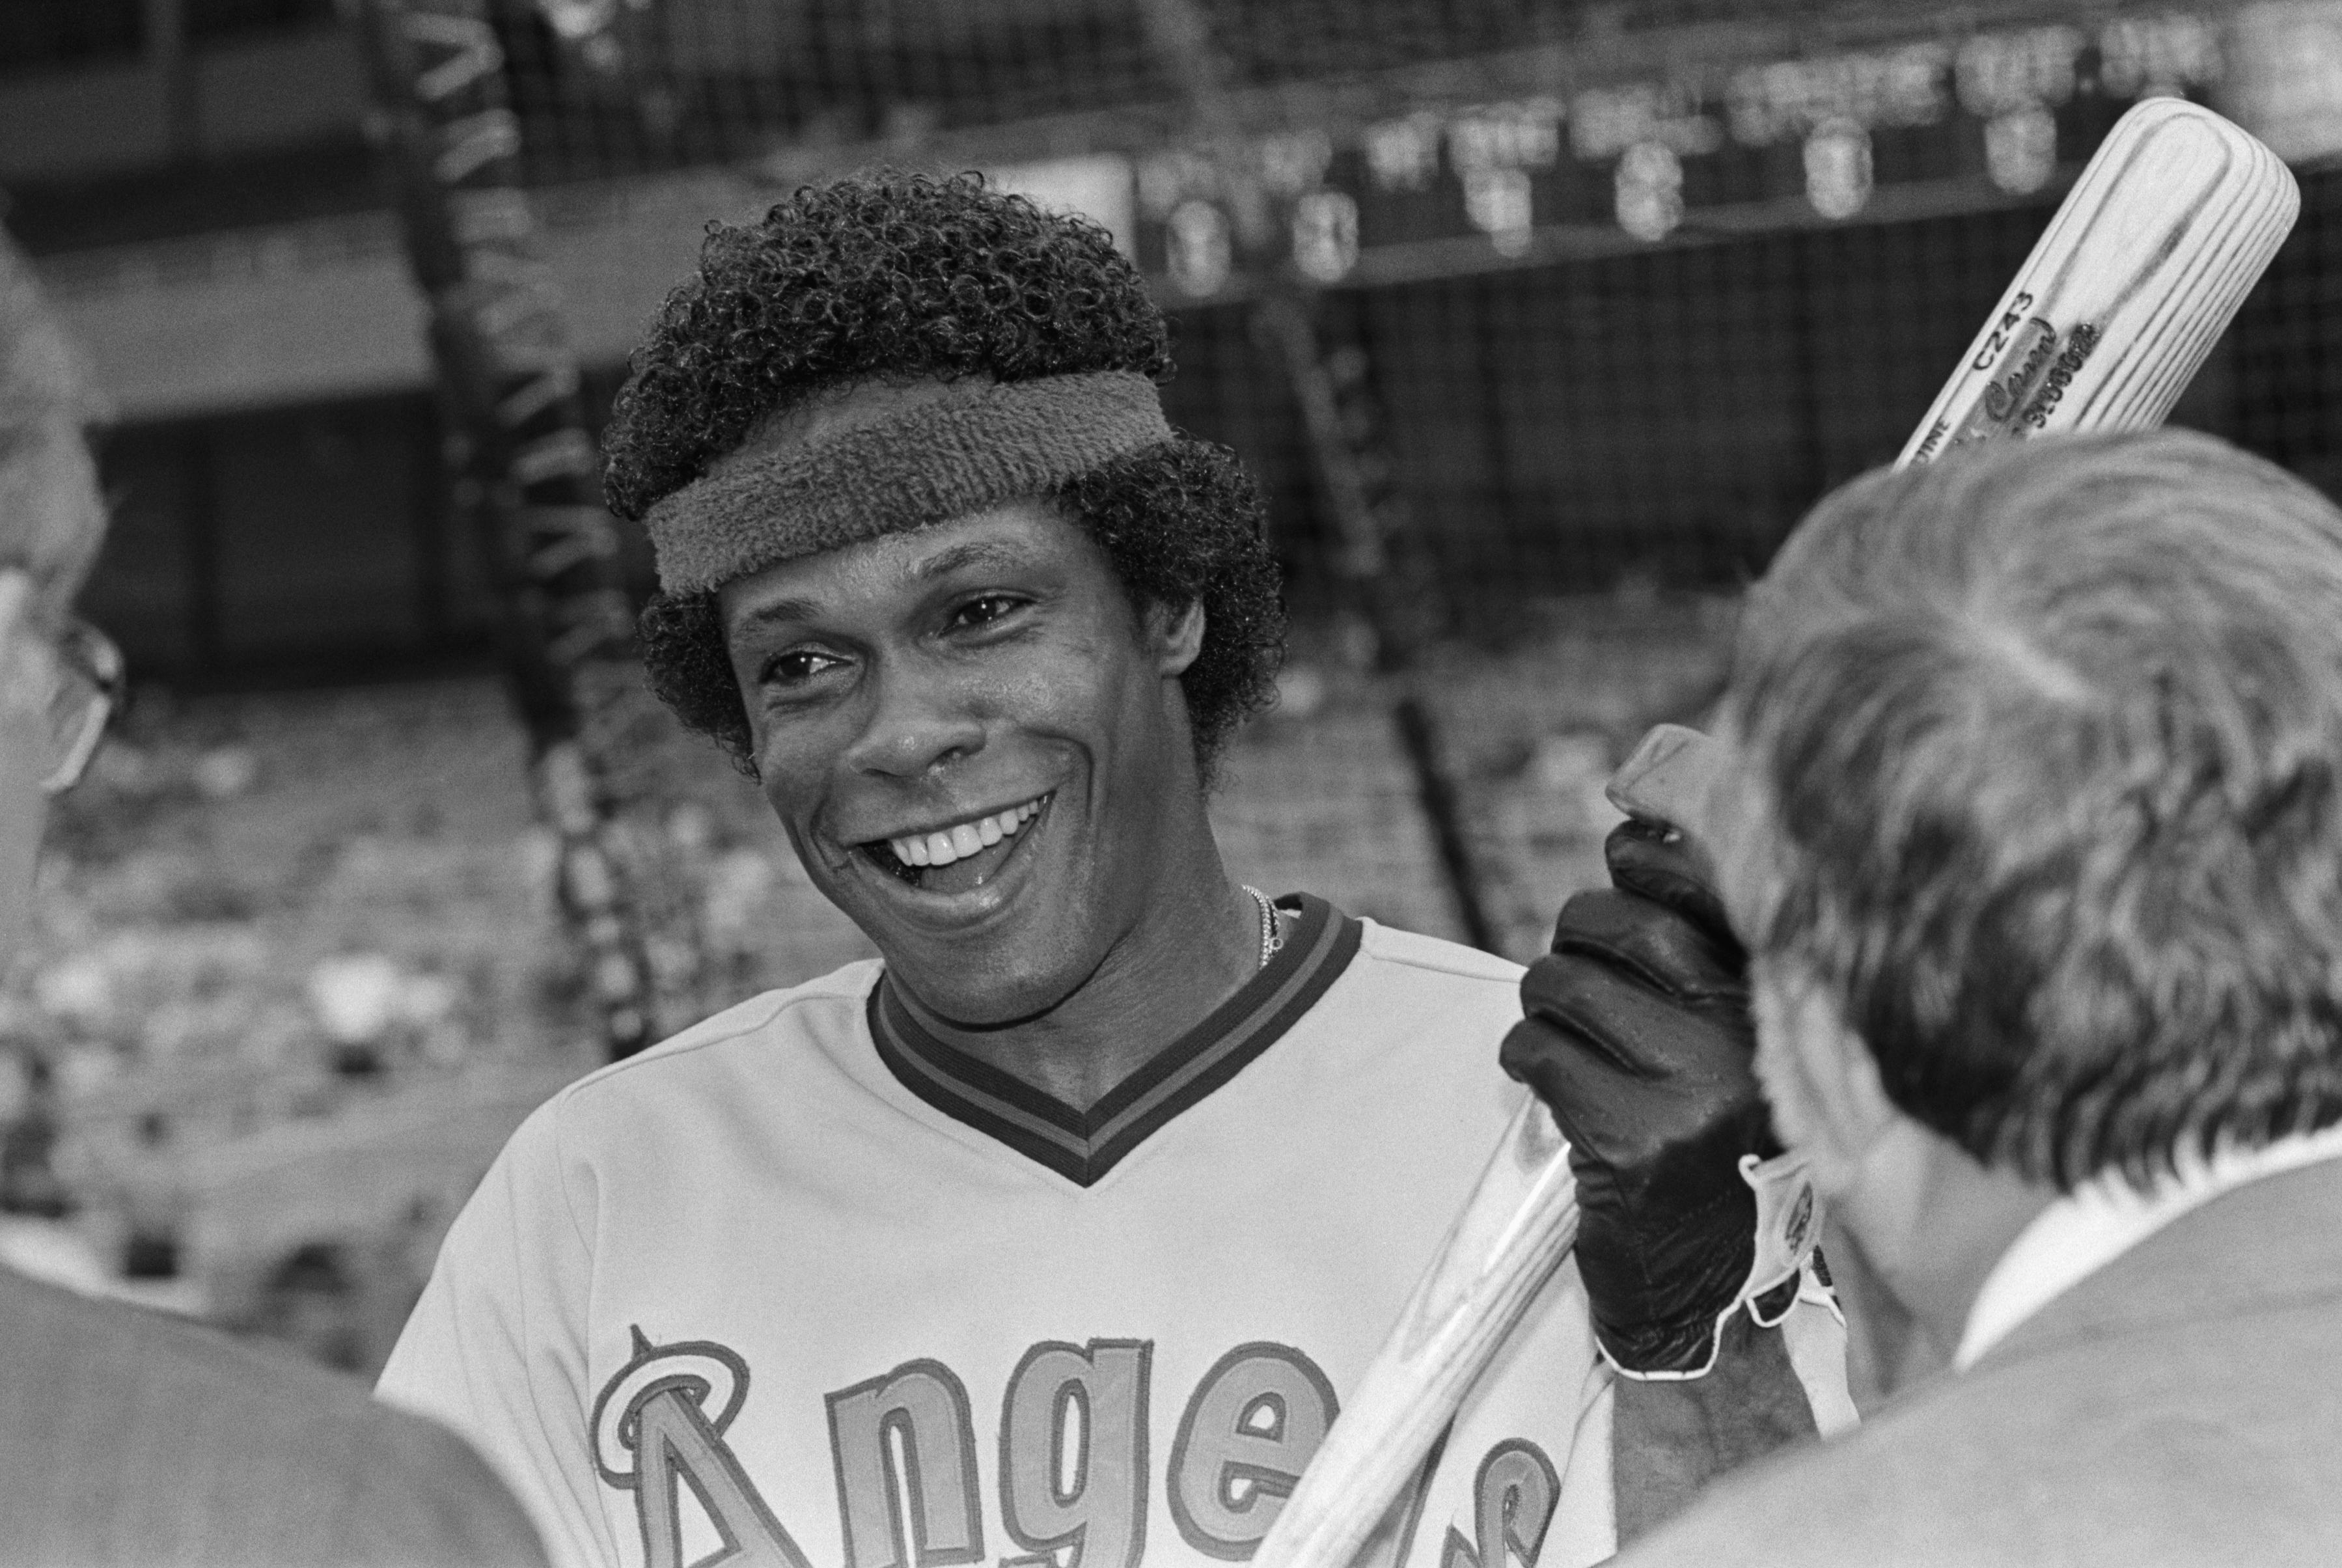 Baseball Player Rod Carew Holding Bat